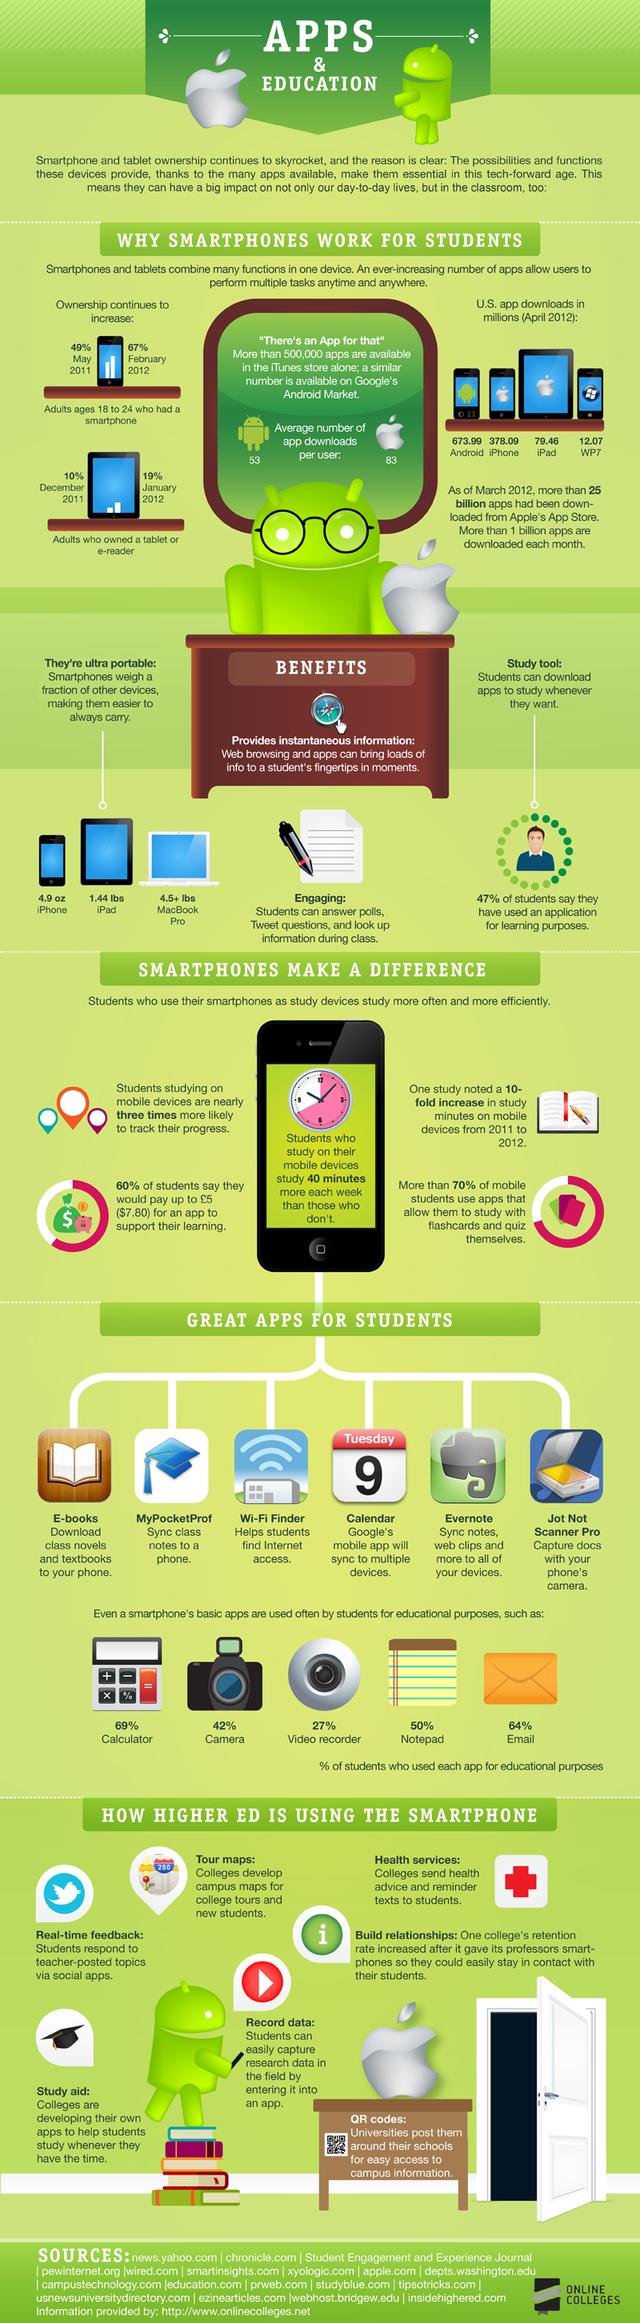 Startpagina Moderne Talen Educacion Aprendizaje Con Móviles Aprendizaje Móvil